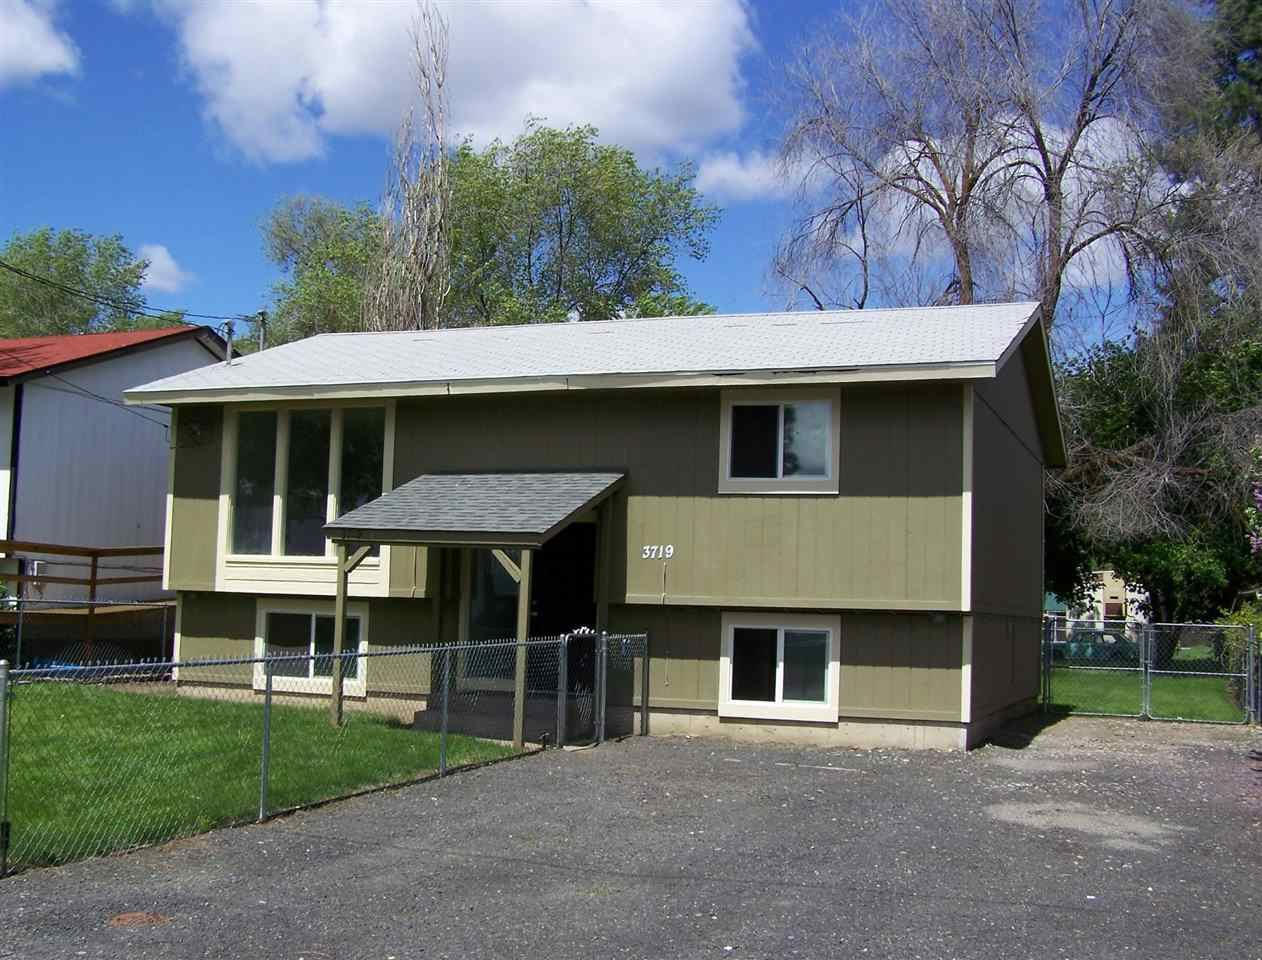 3719 E GUY Ave, Mead, WA 99021 - #: 202015966